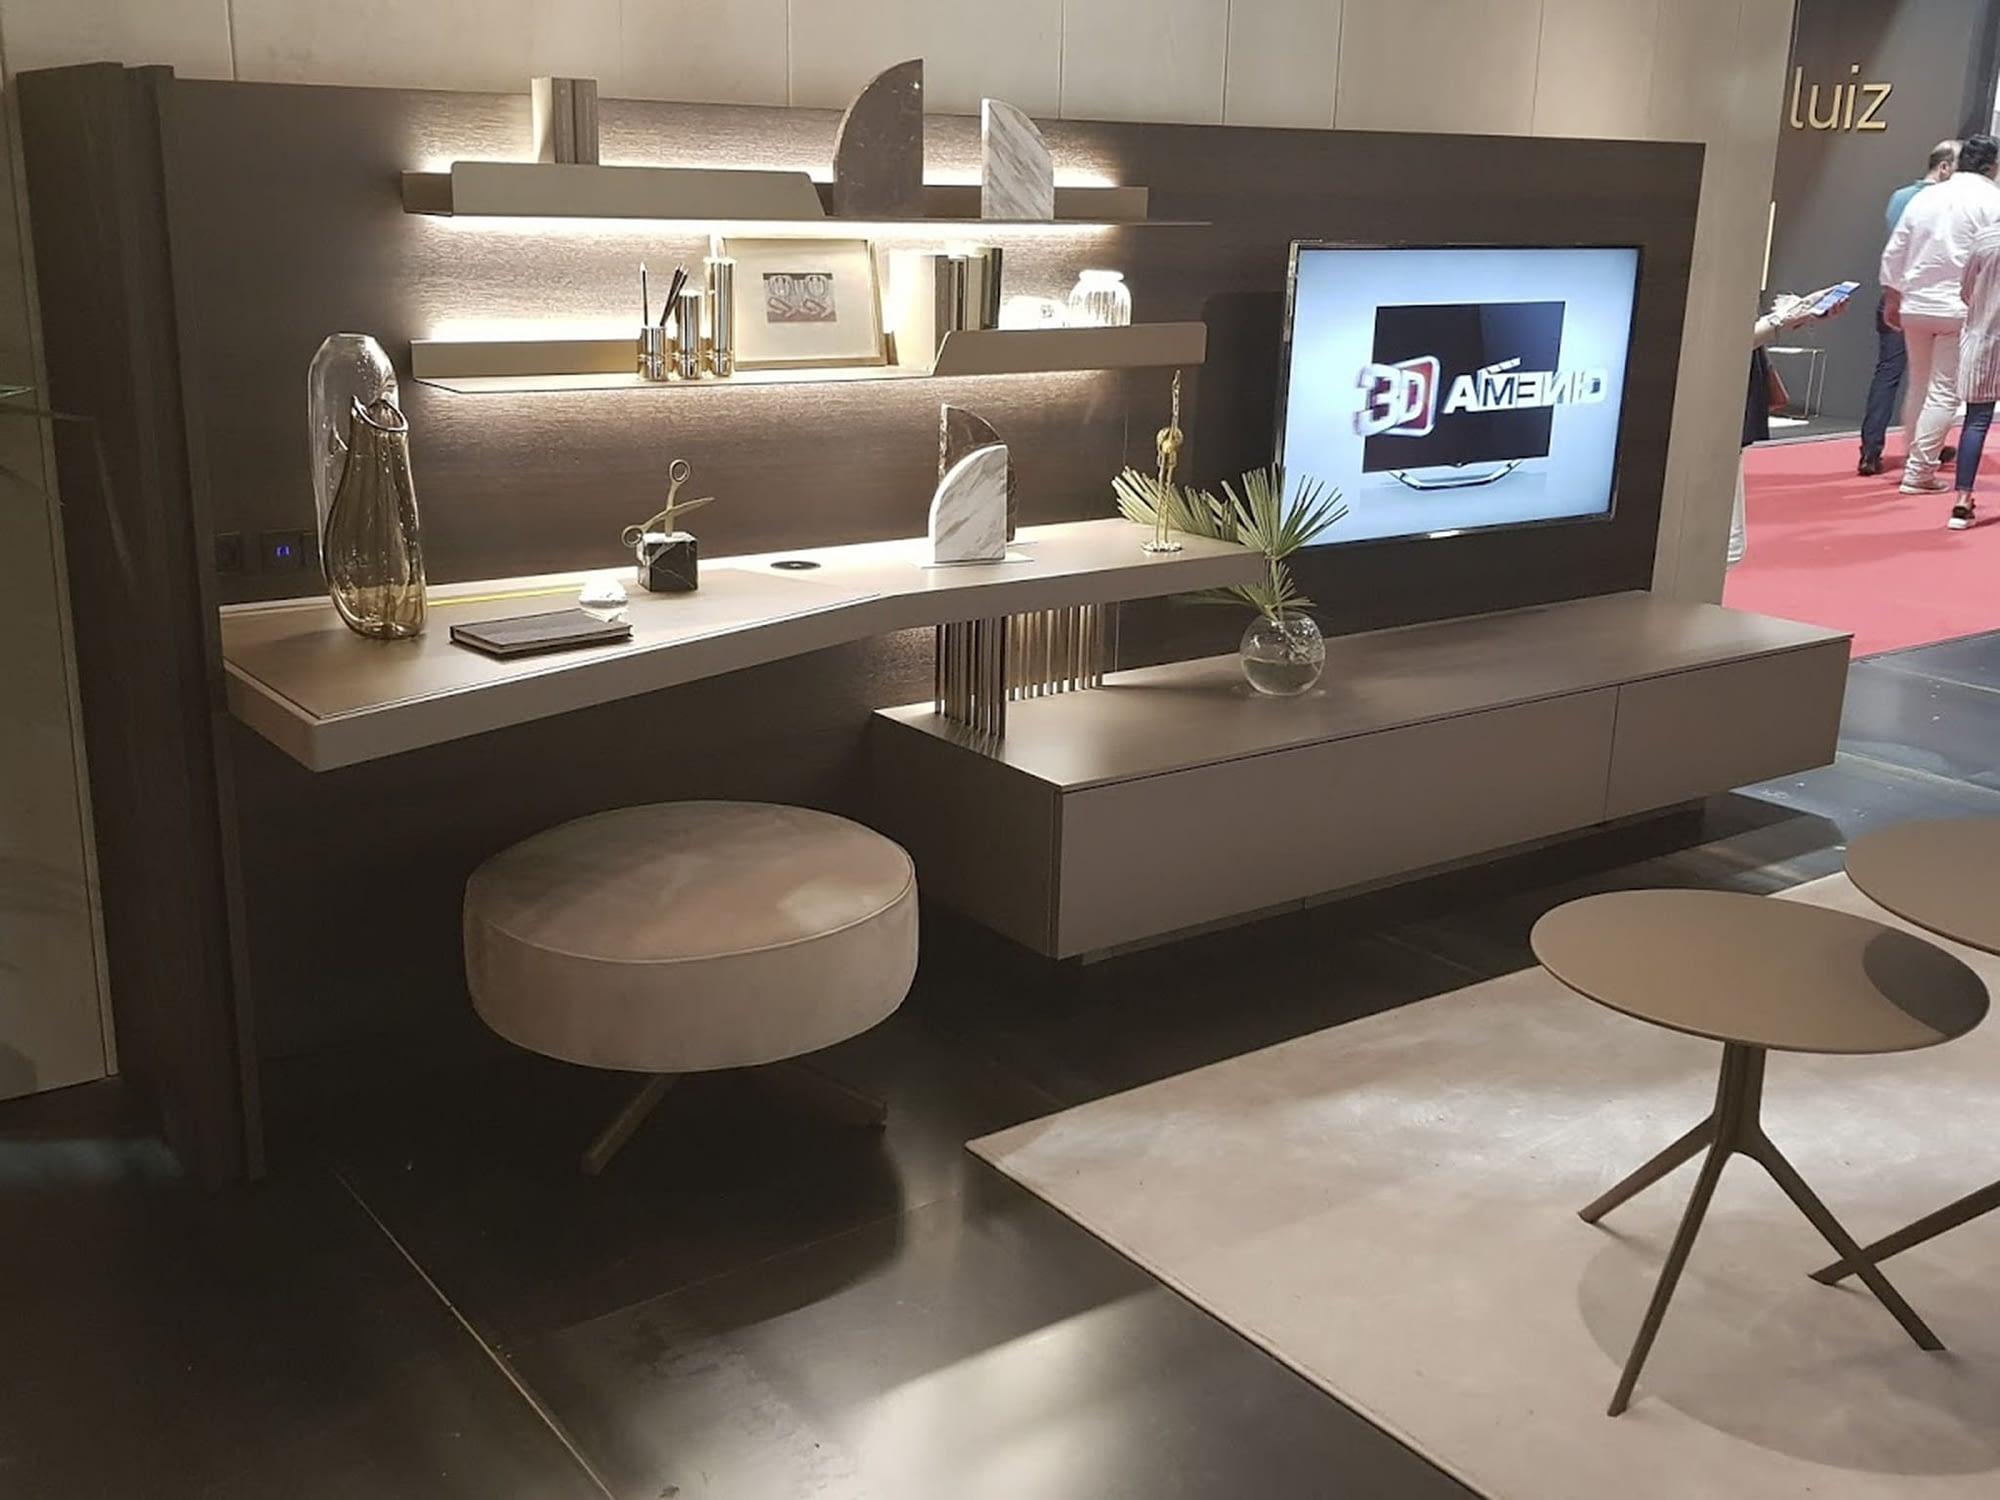 Milano Design Week 2018 - Salone del Mobile 48